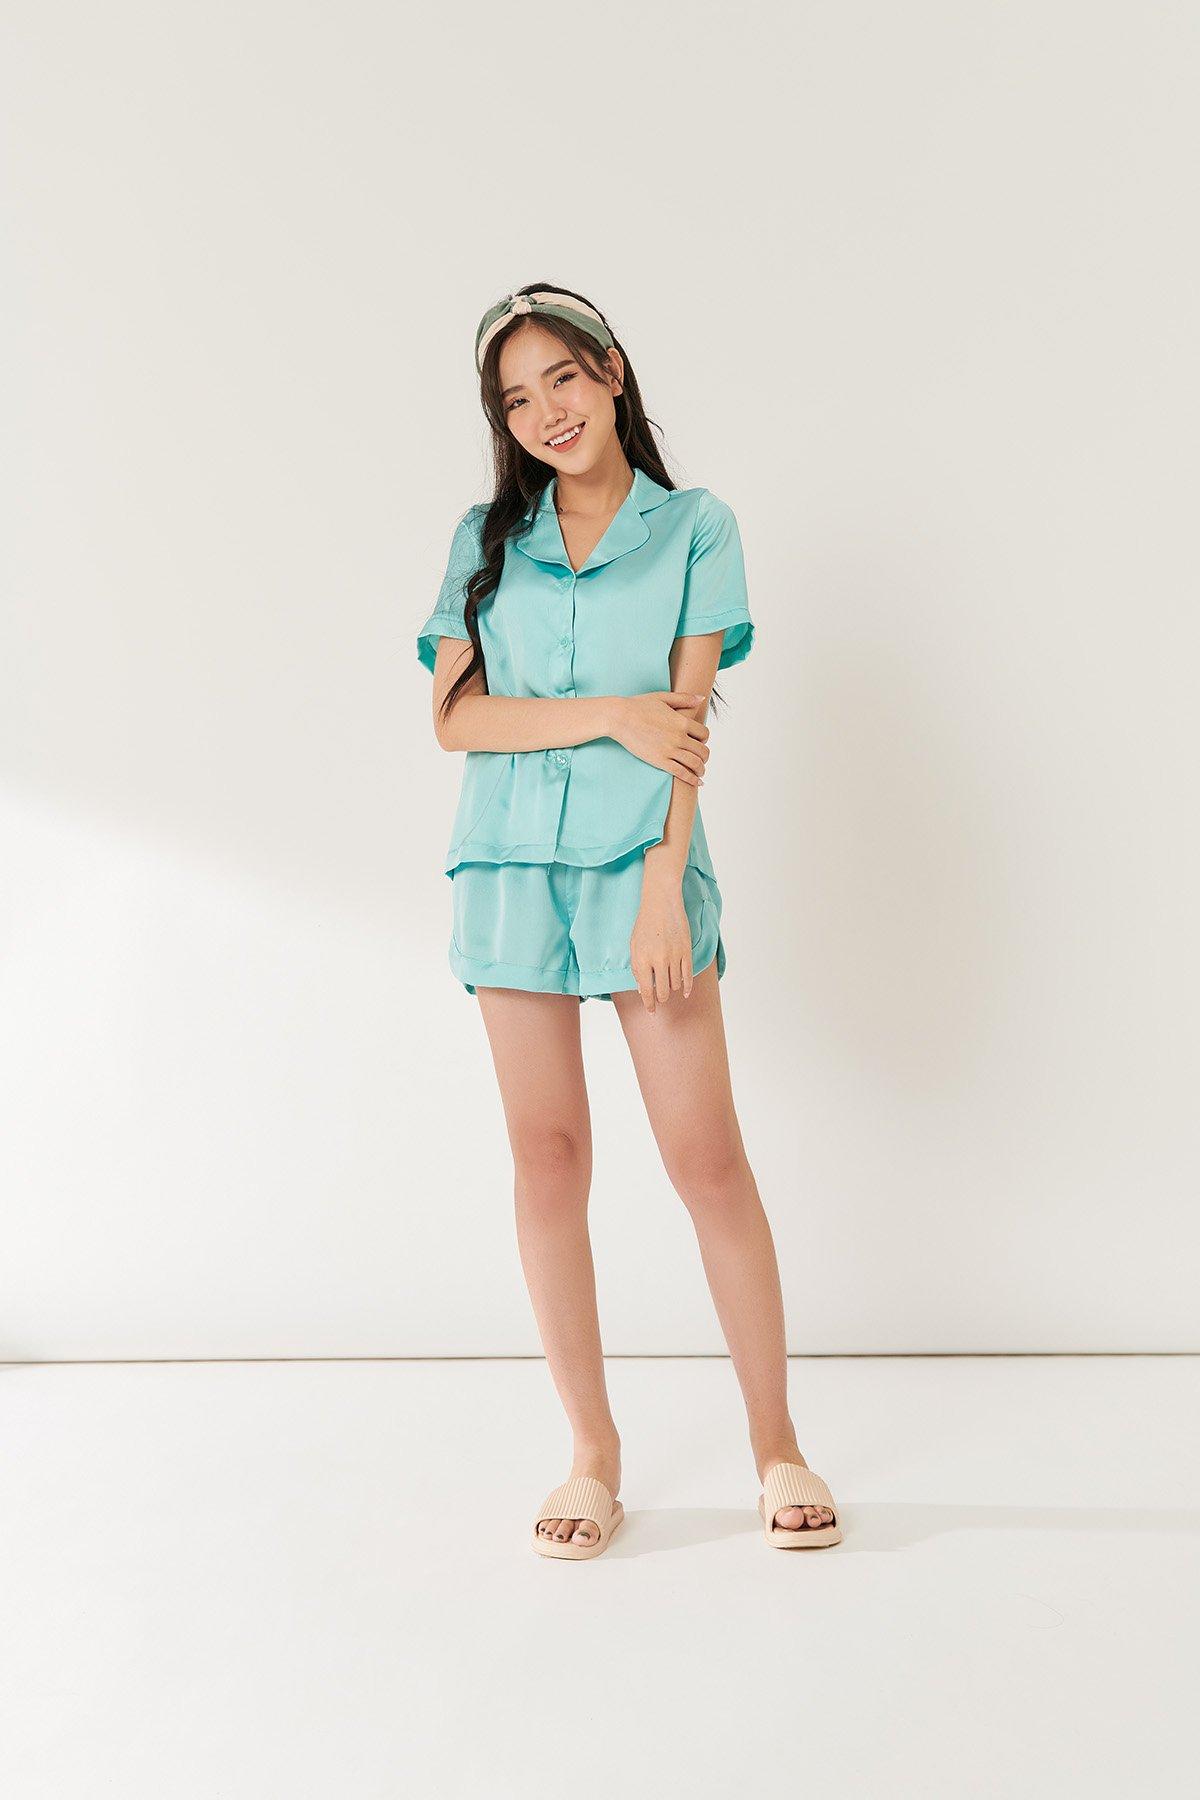 Bộ Pyjama xanh ngọc - Turquoise short sleeves pyjama